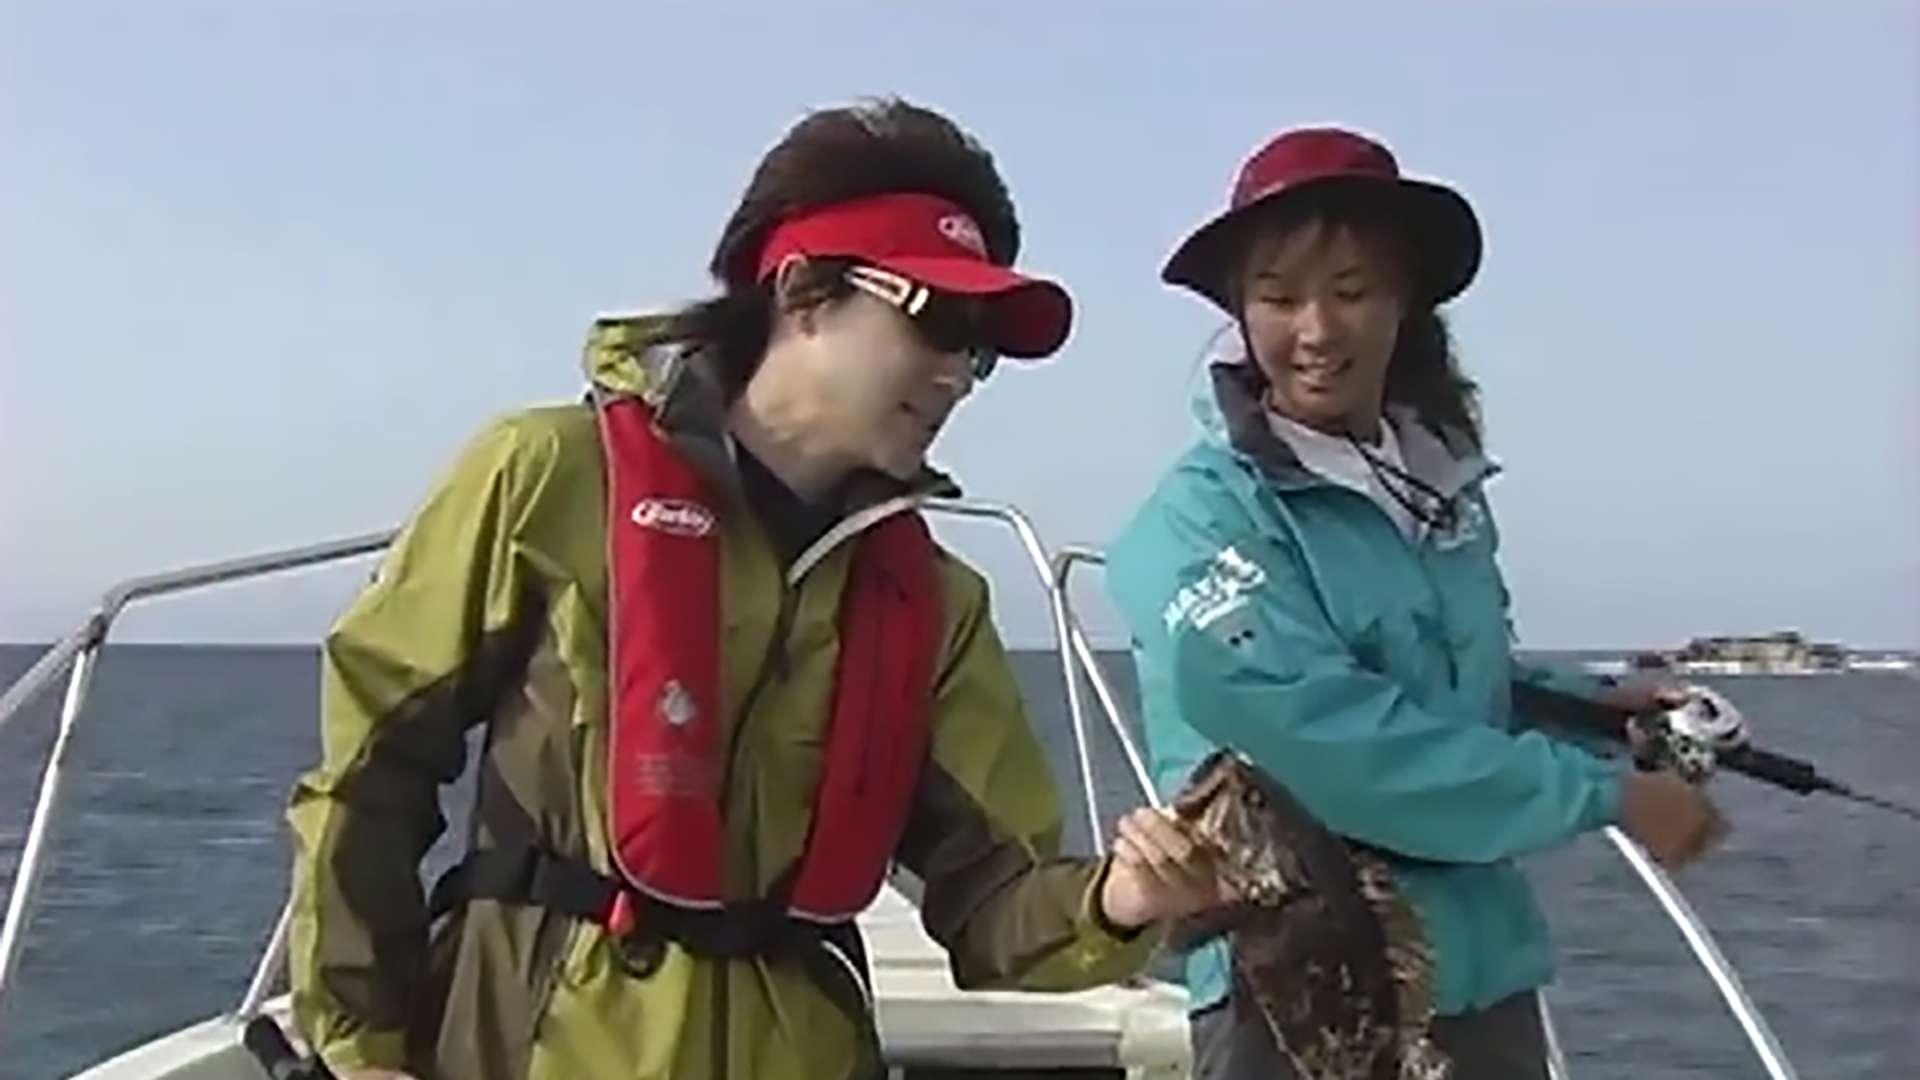 日本100魚種制覇の旅 児島玲子 in石巻(宮城県)